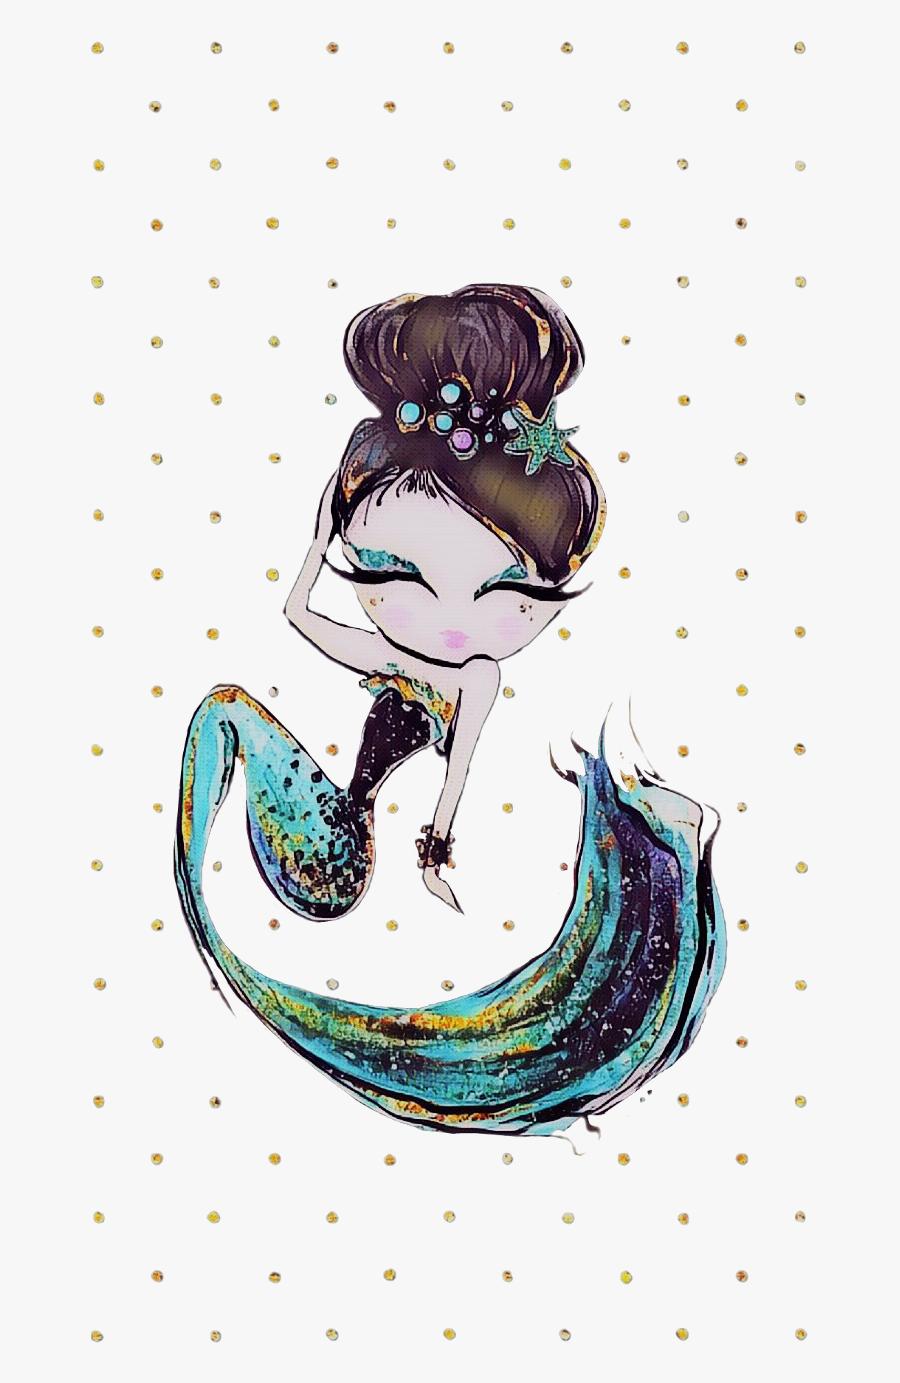 #mermaid #mermaidtail #fishtail #tail #siren #sirena - Audrey Hepburn Sunglasses Draw, Transparent Clipart